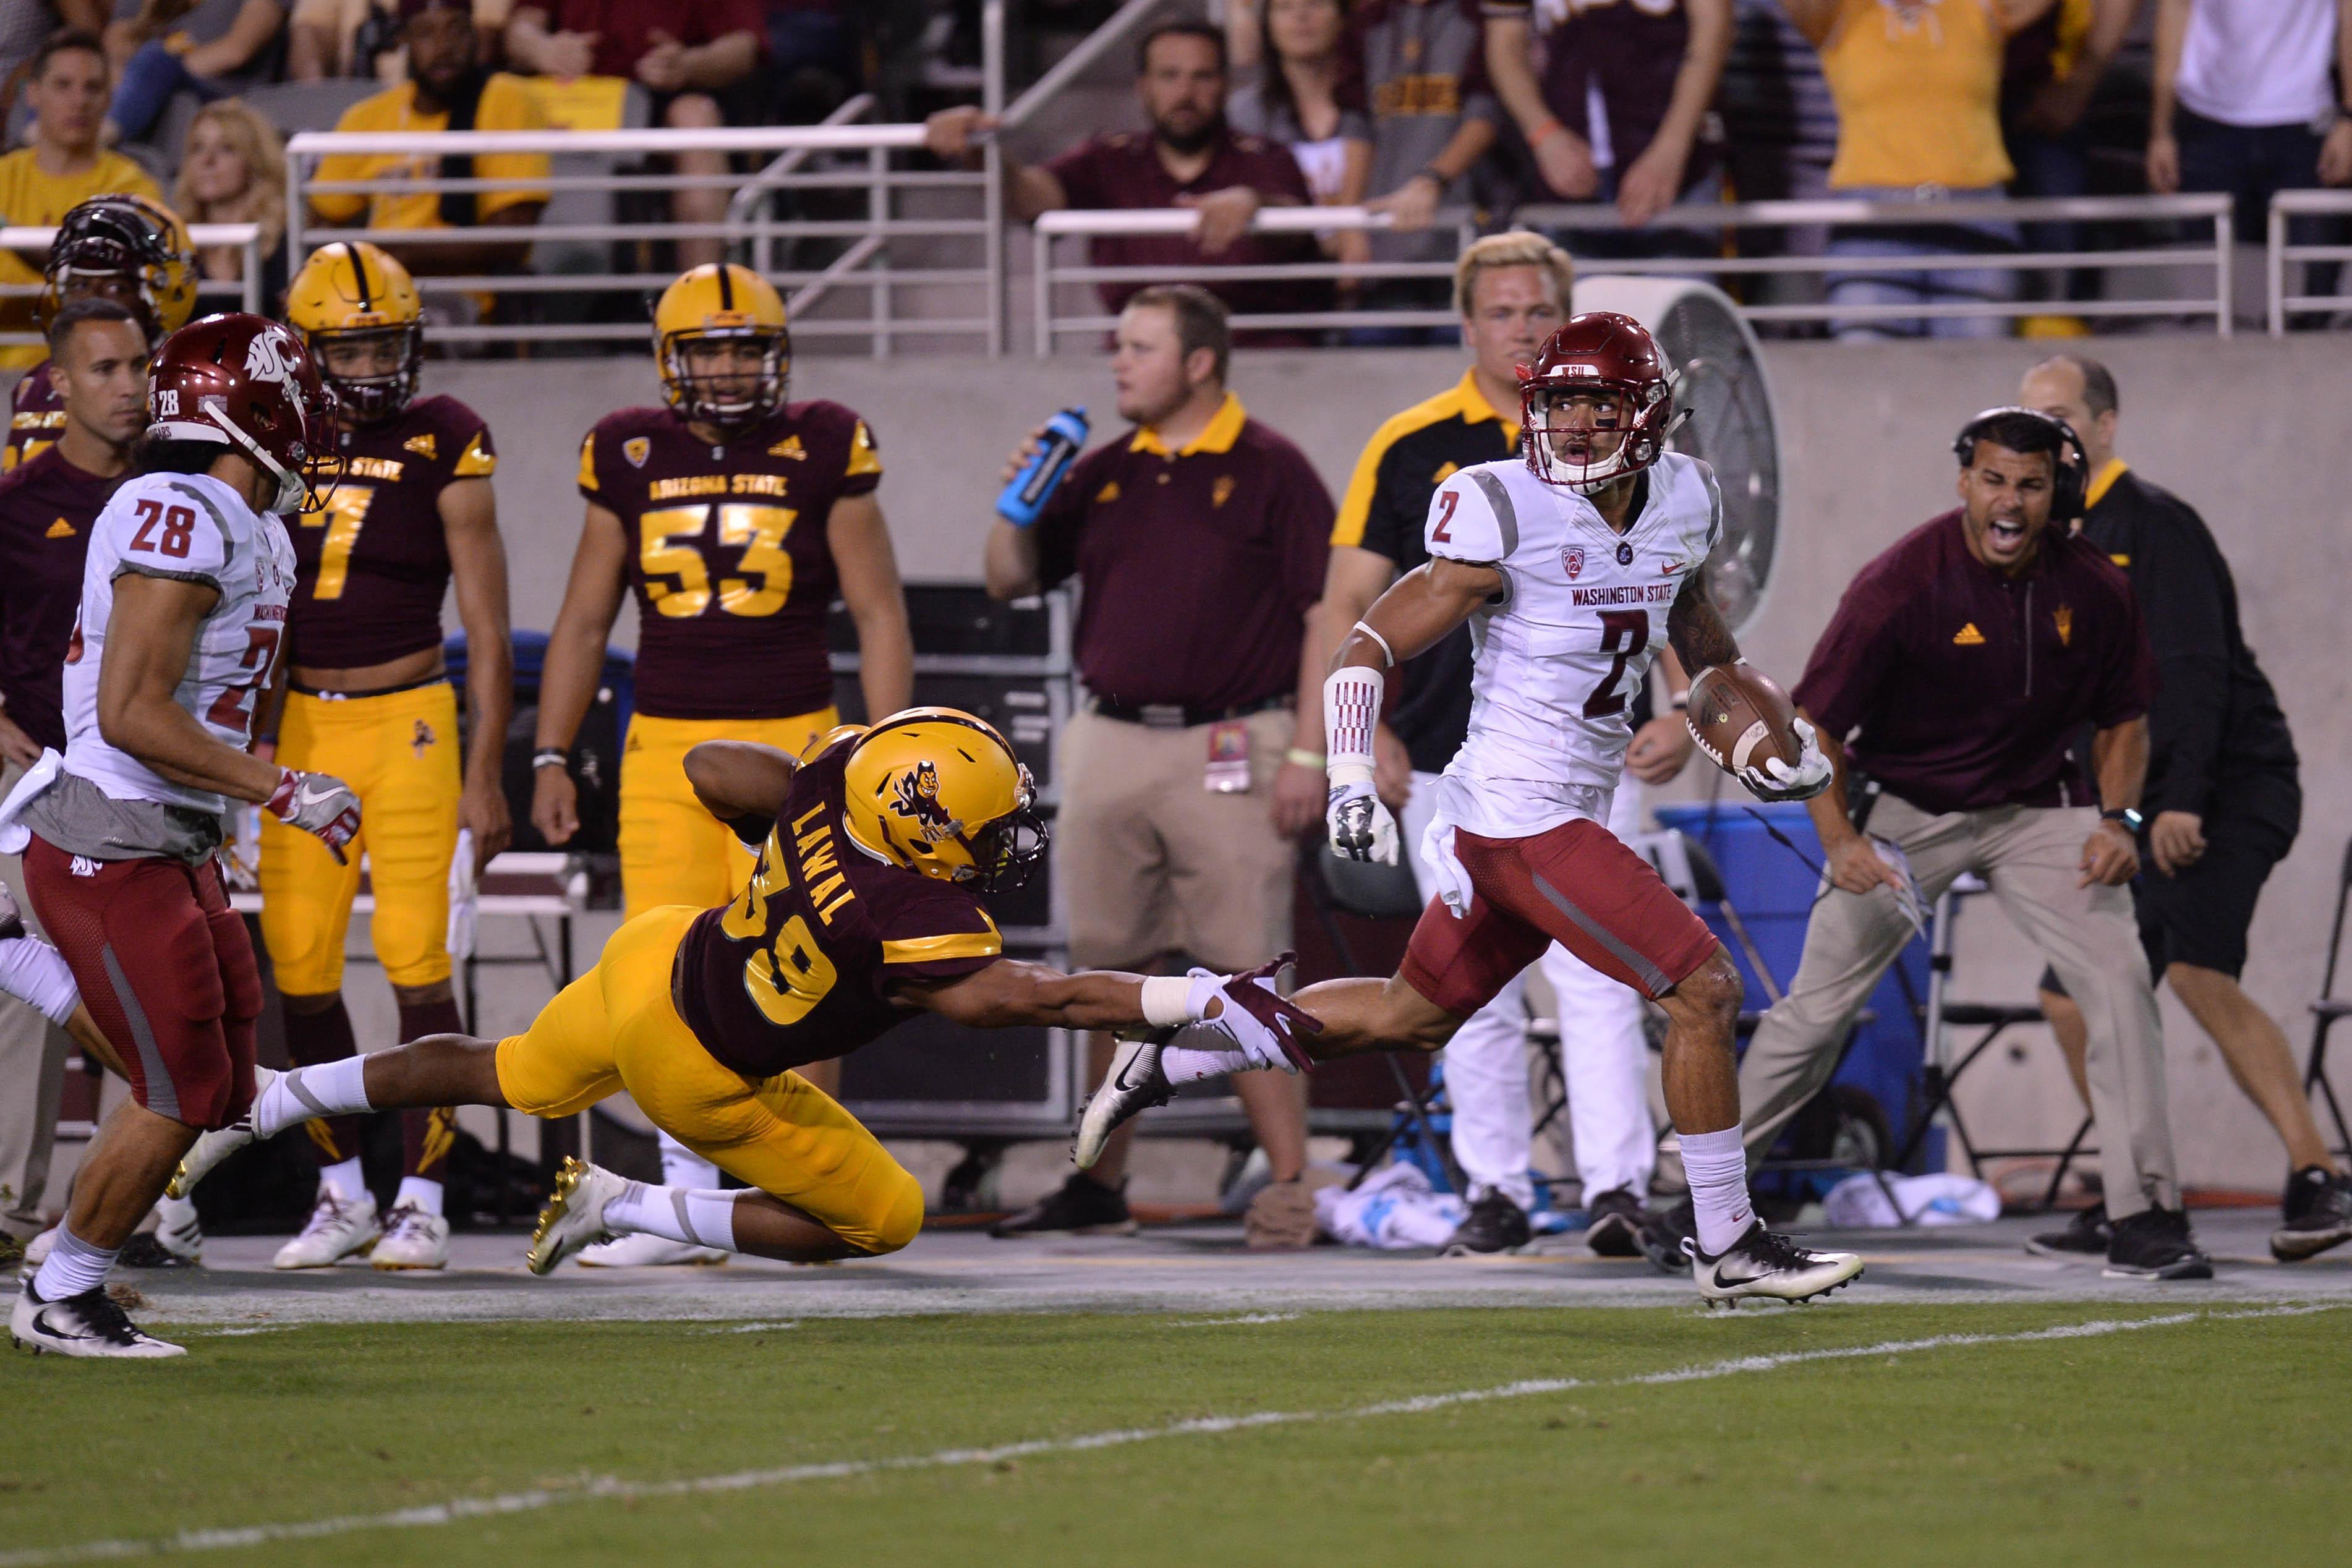 WSU-ASU Notes: Robert Taylor's Kickoff Return For TD First